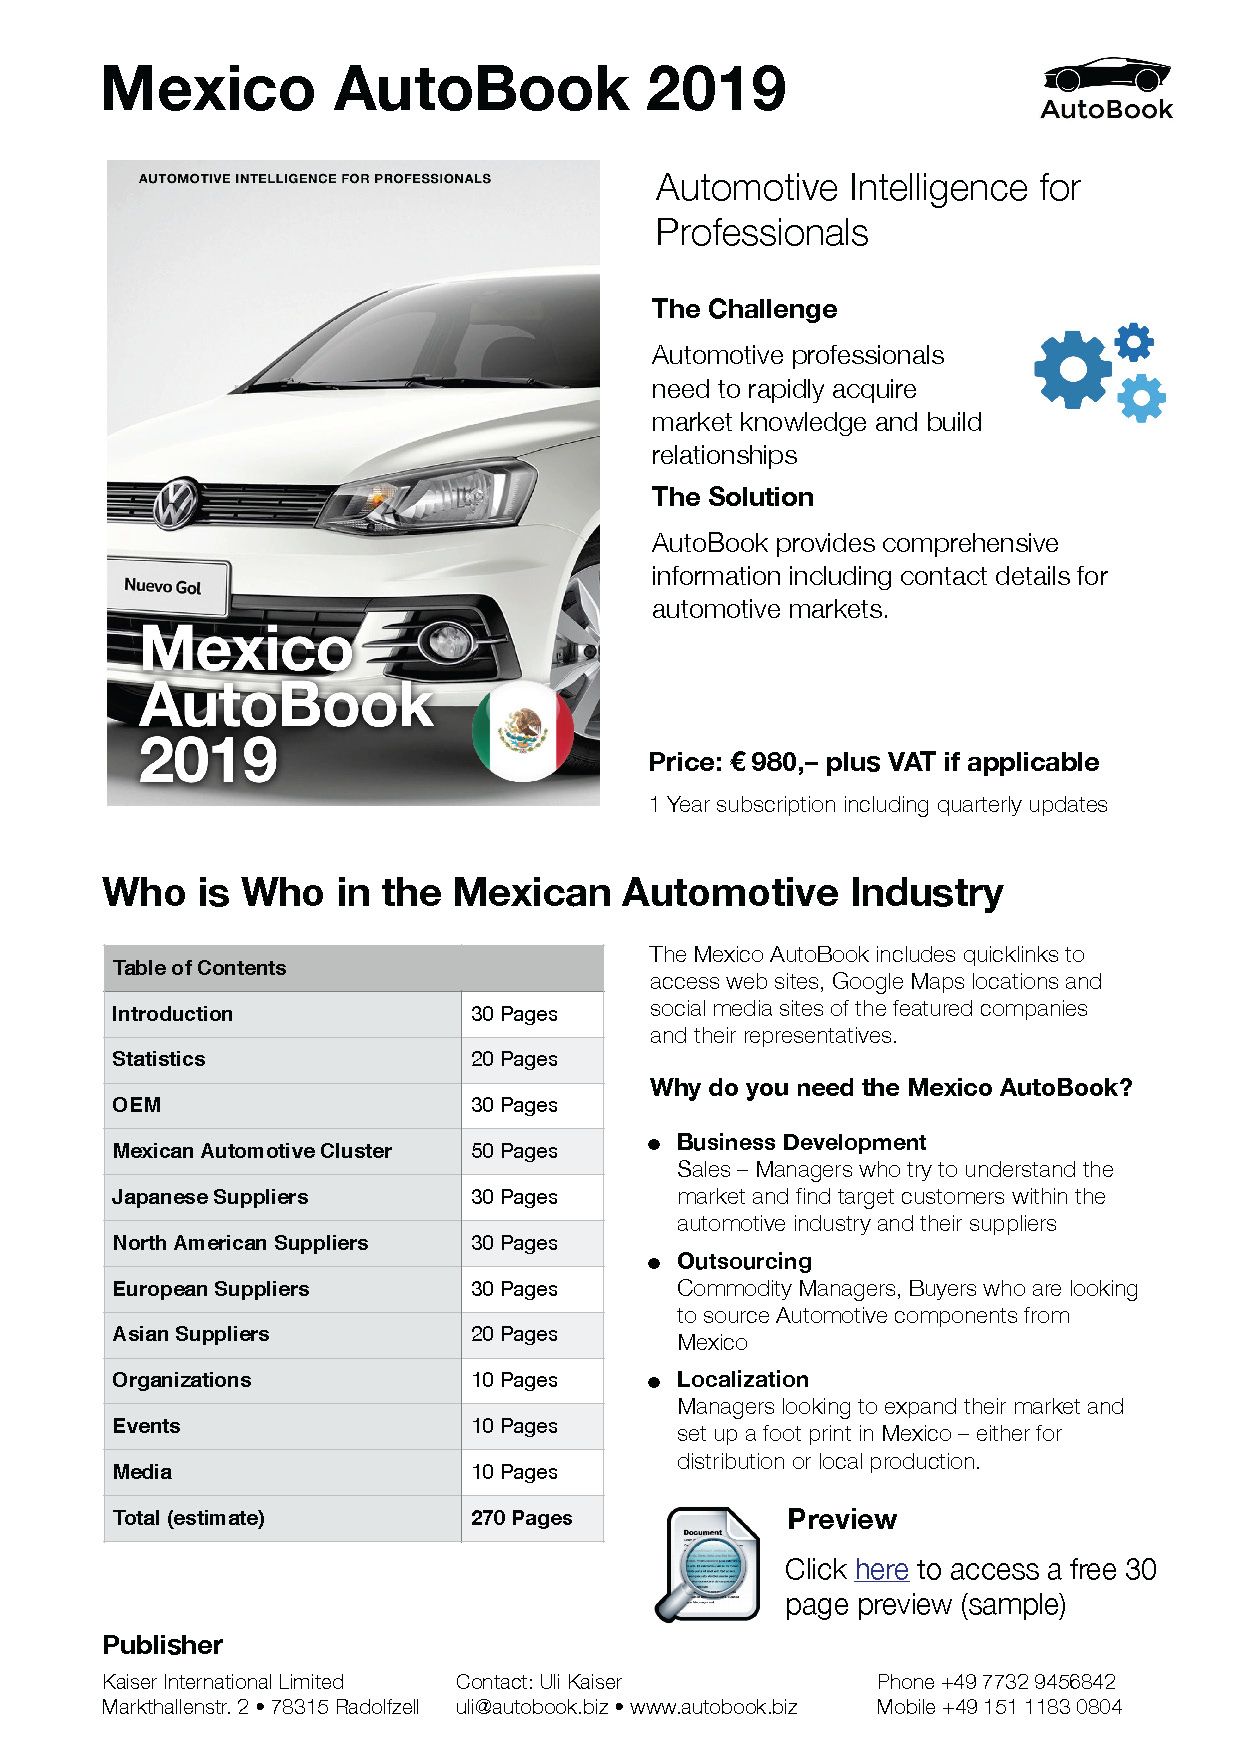 Mexico AutoBook 2019 Datasheet.jpg